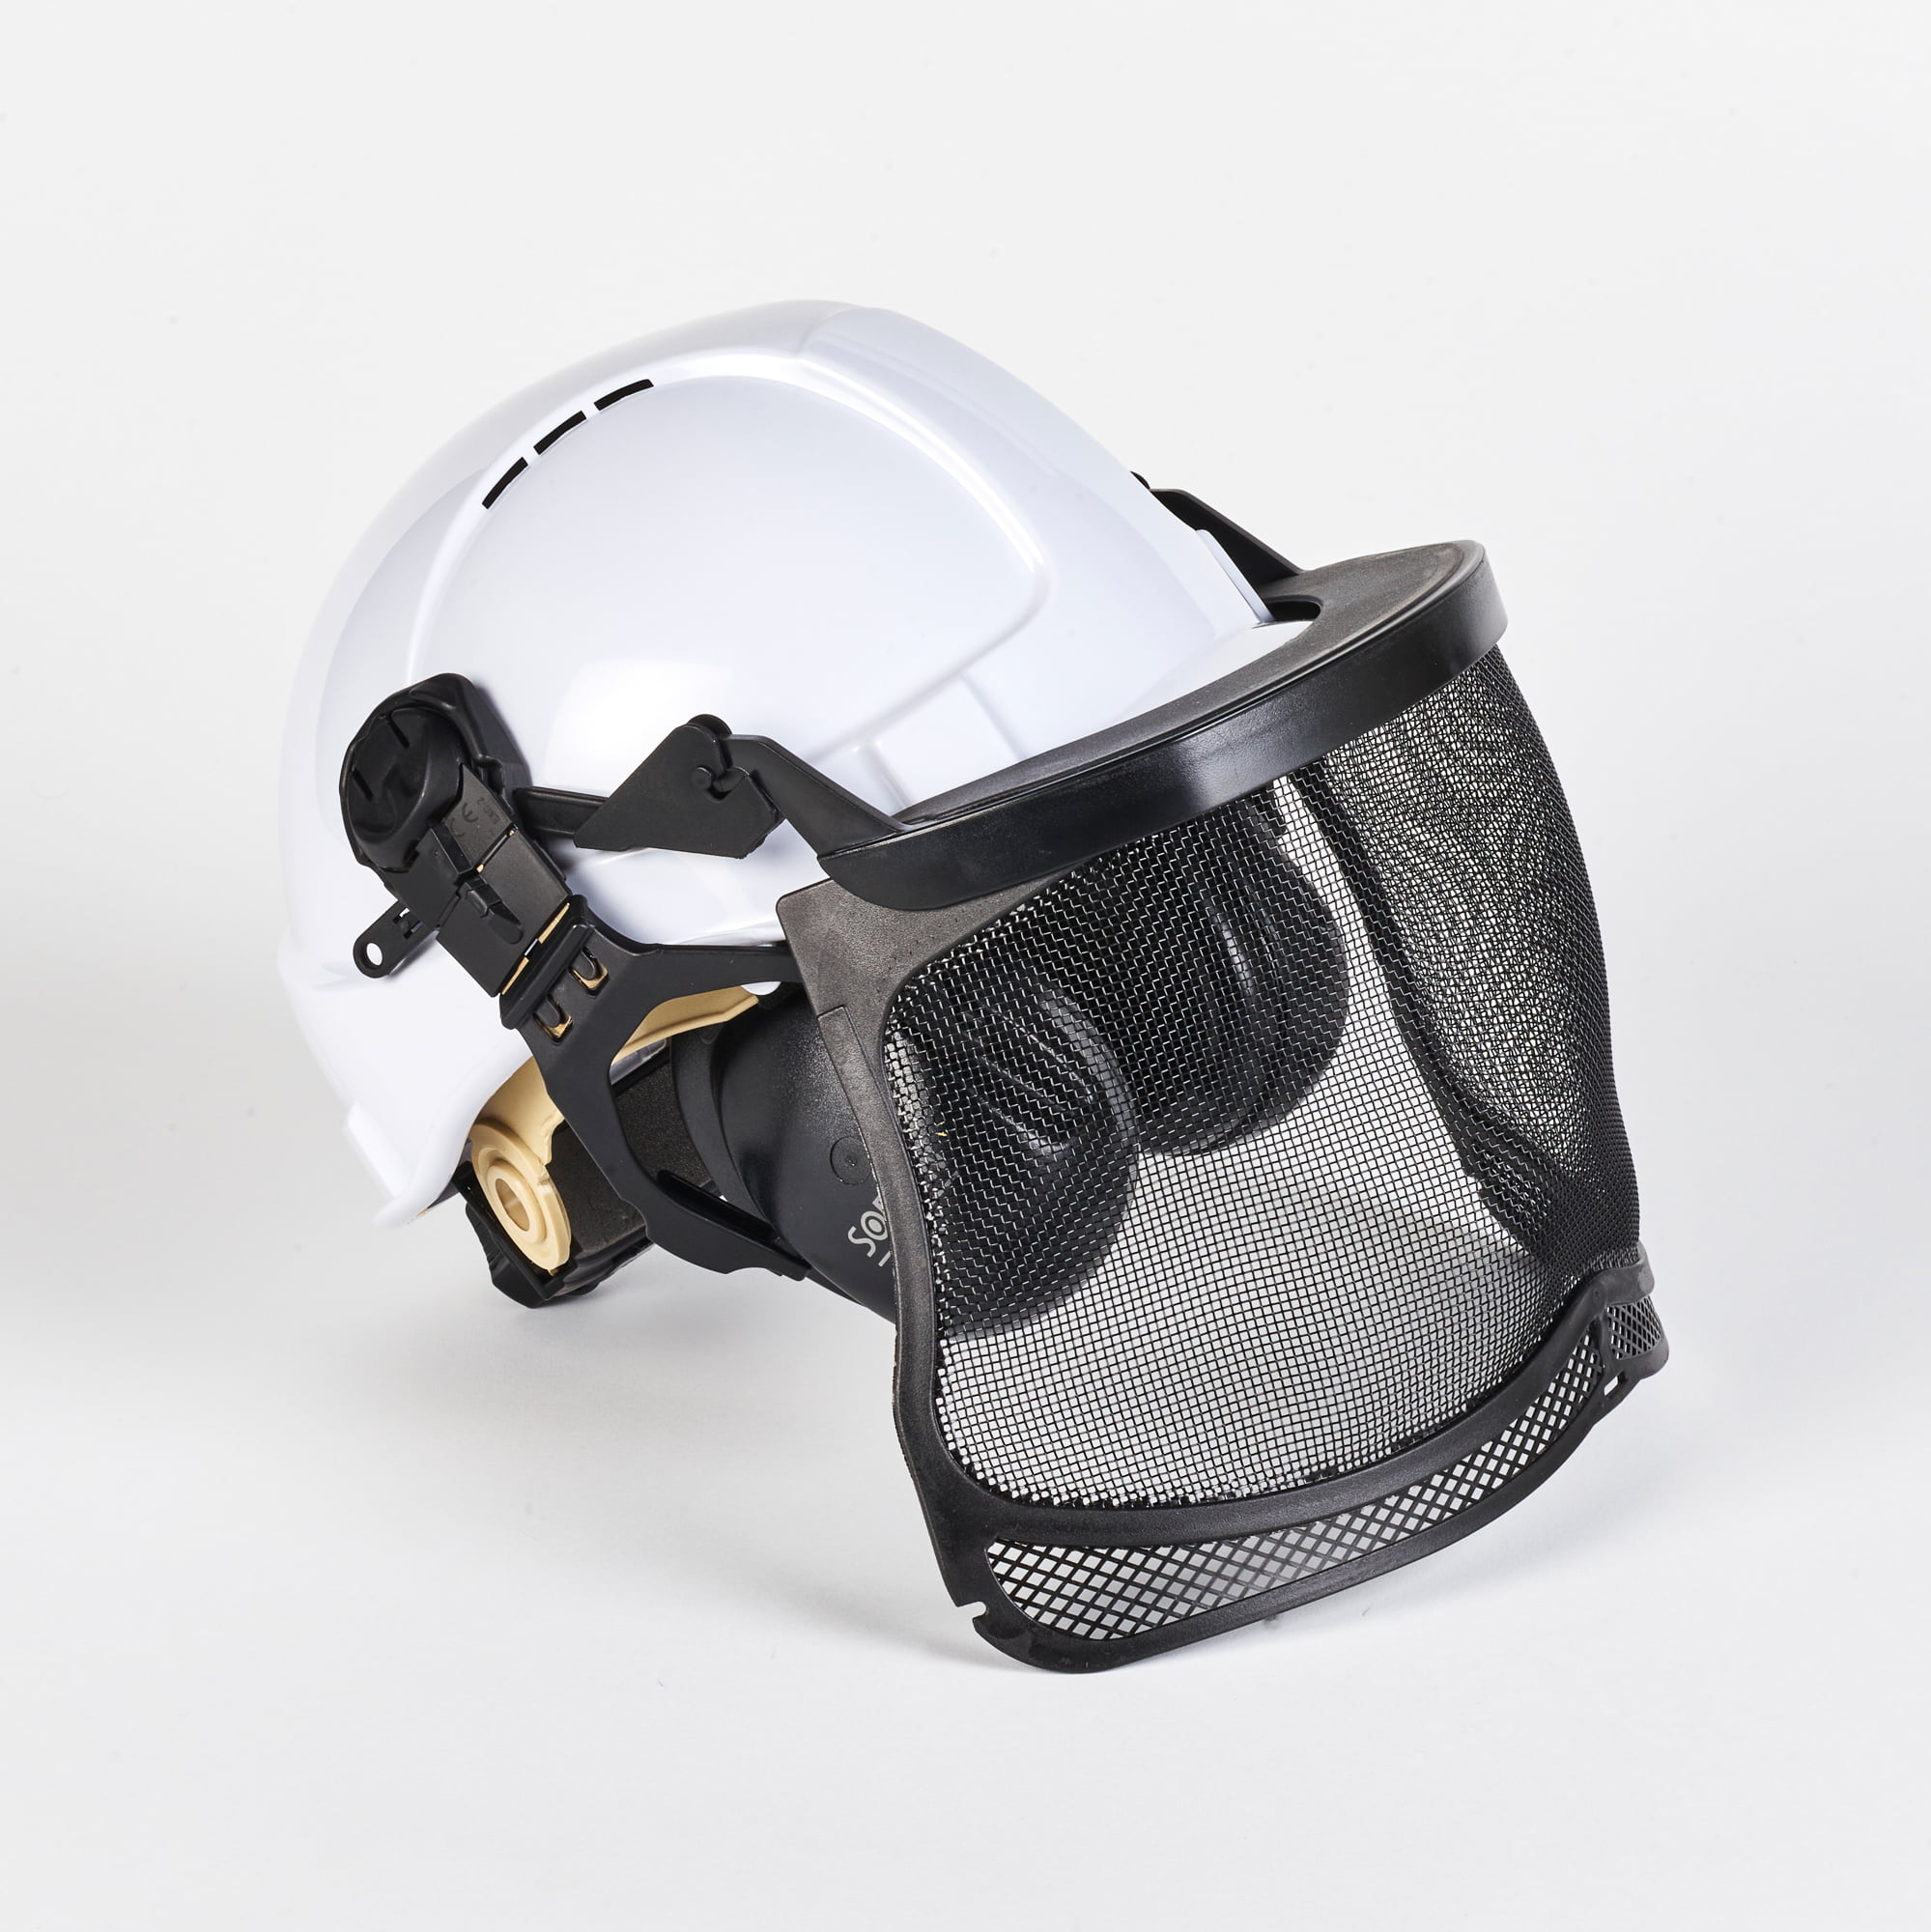 Base Tech Forestry Ground Helmet SNR 31dB (White)